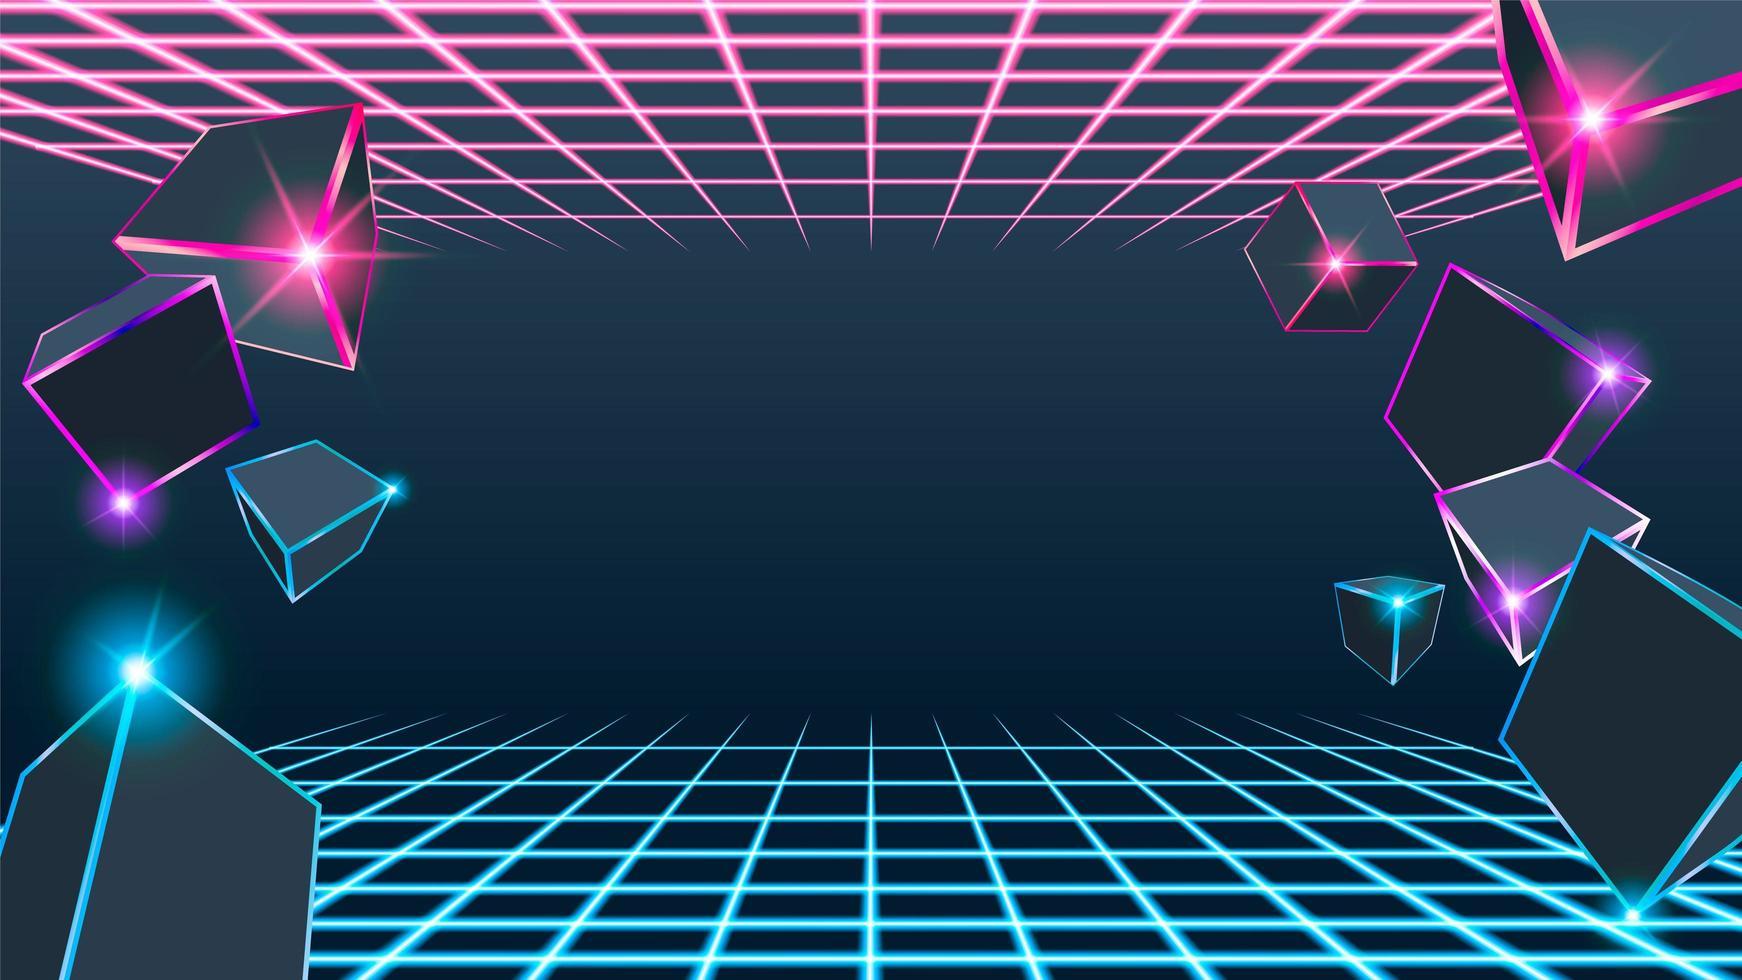 3d Cube Pink And Blue Neon Box Download Free Vectors Clipart Graphics Vector Art